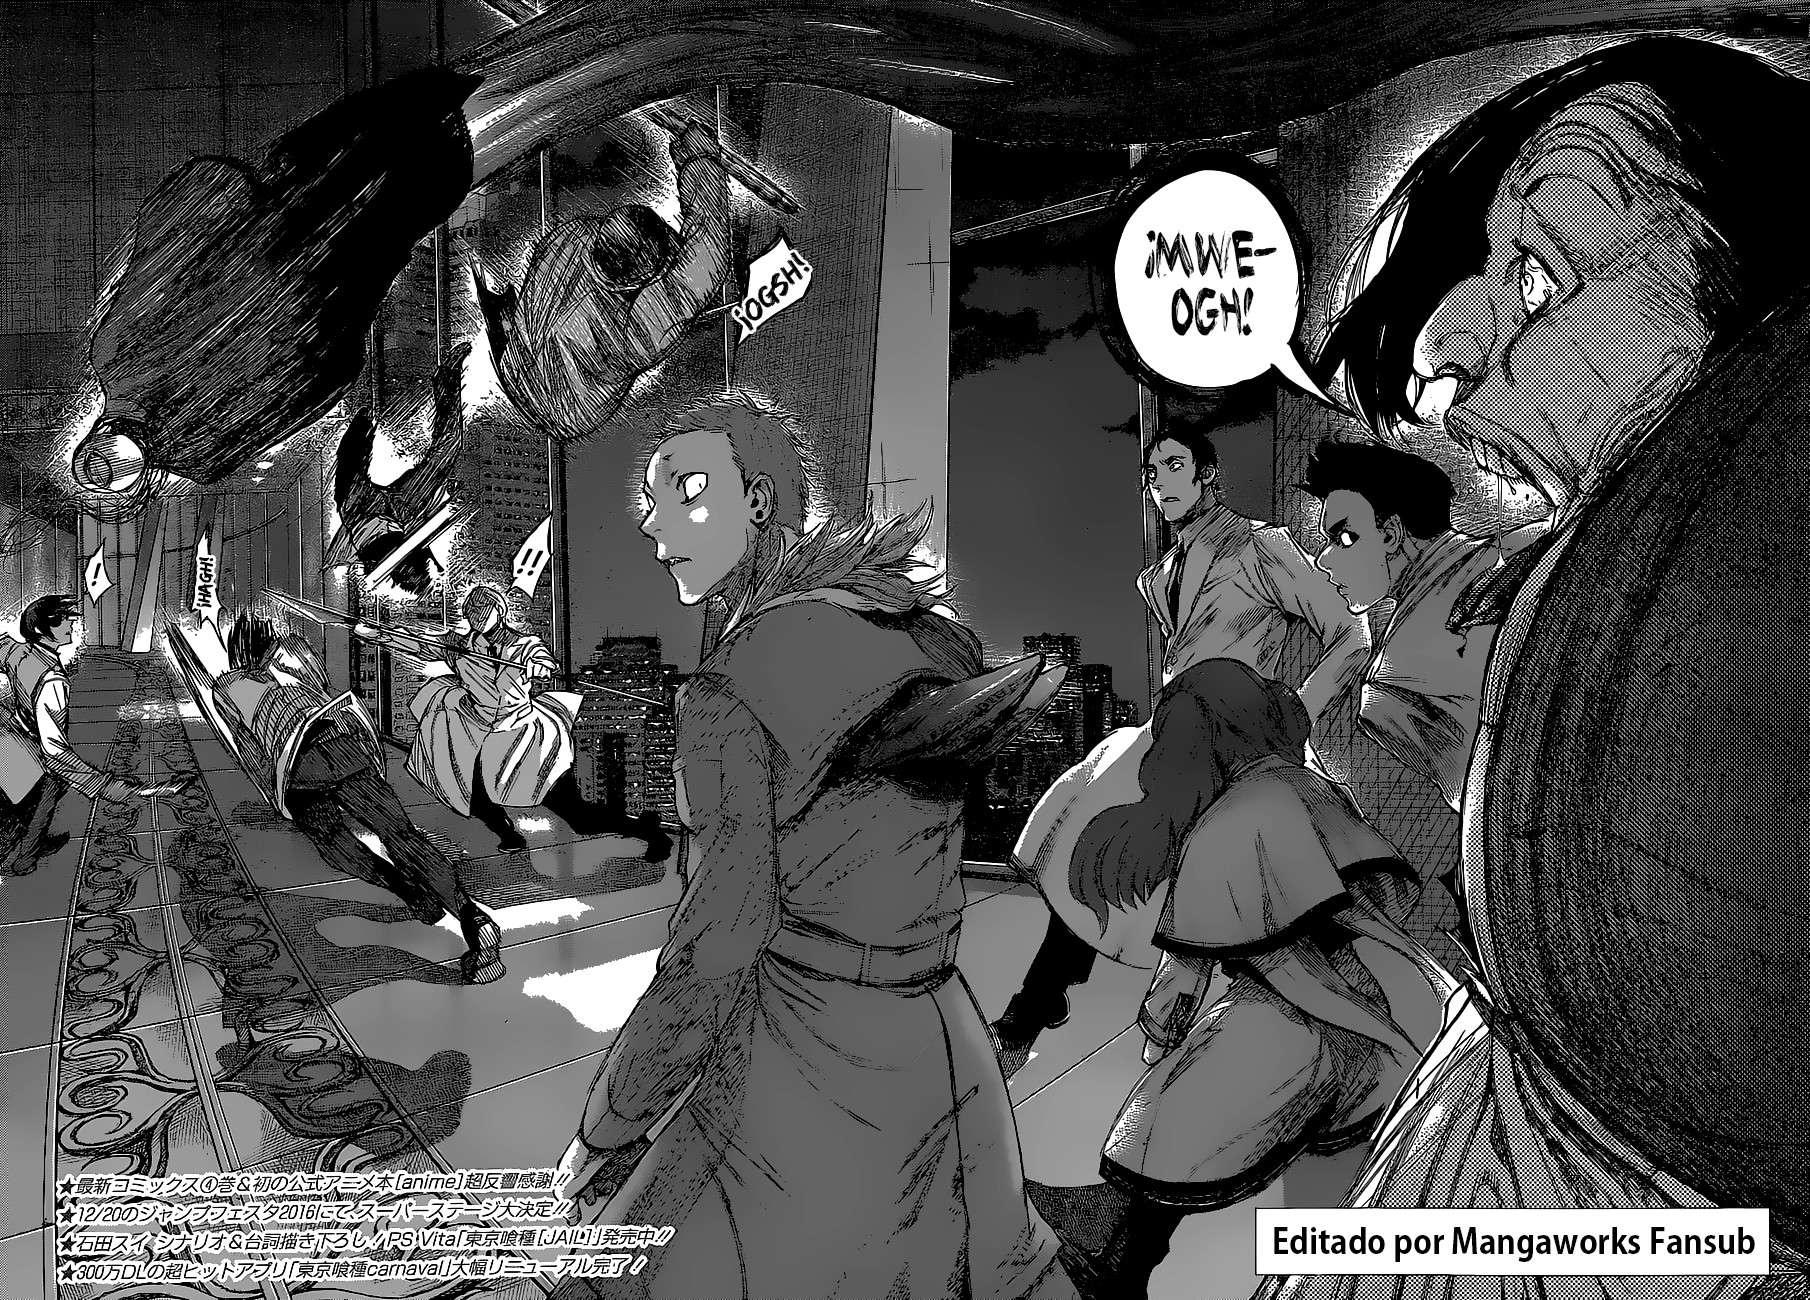 https://c5.ninemanga.com/es_manga/59/59/420024/80fd4c6a571eafc1f1663d245068e188.jpg Page 4